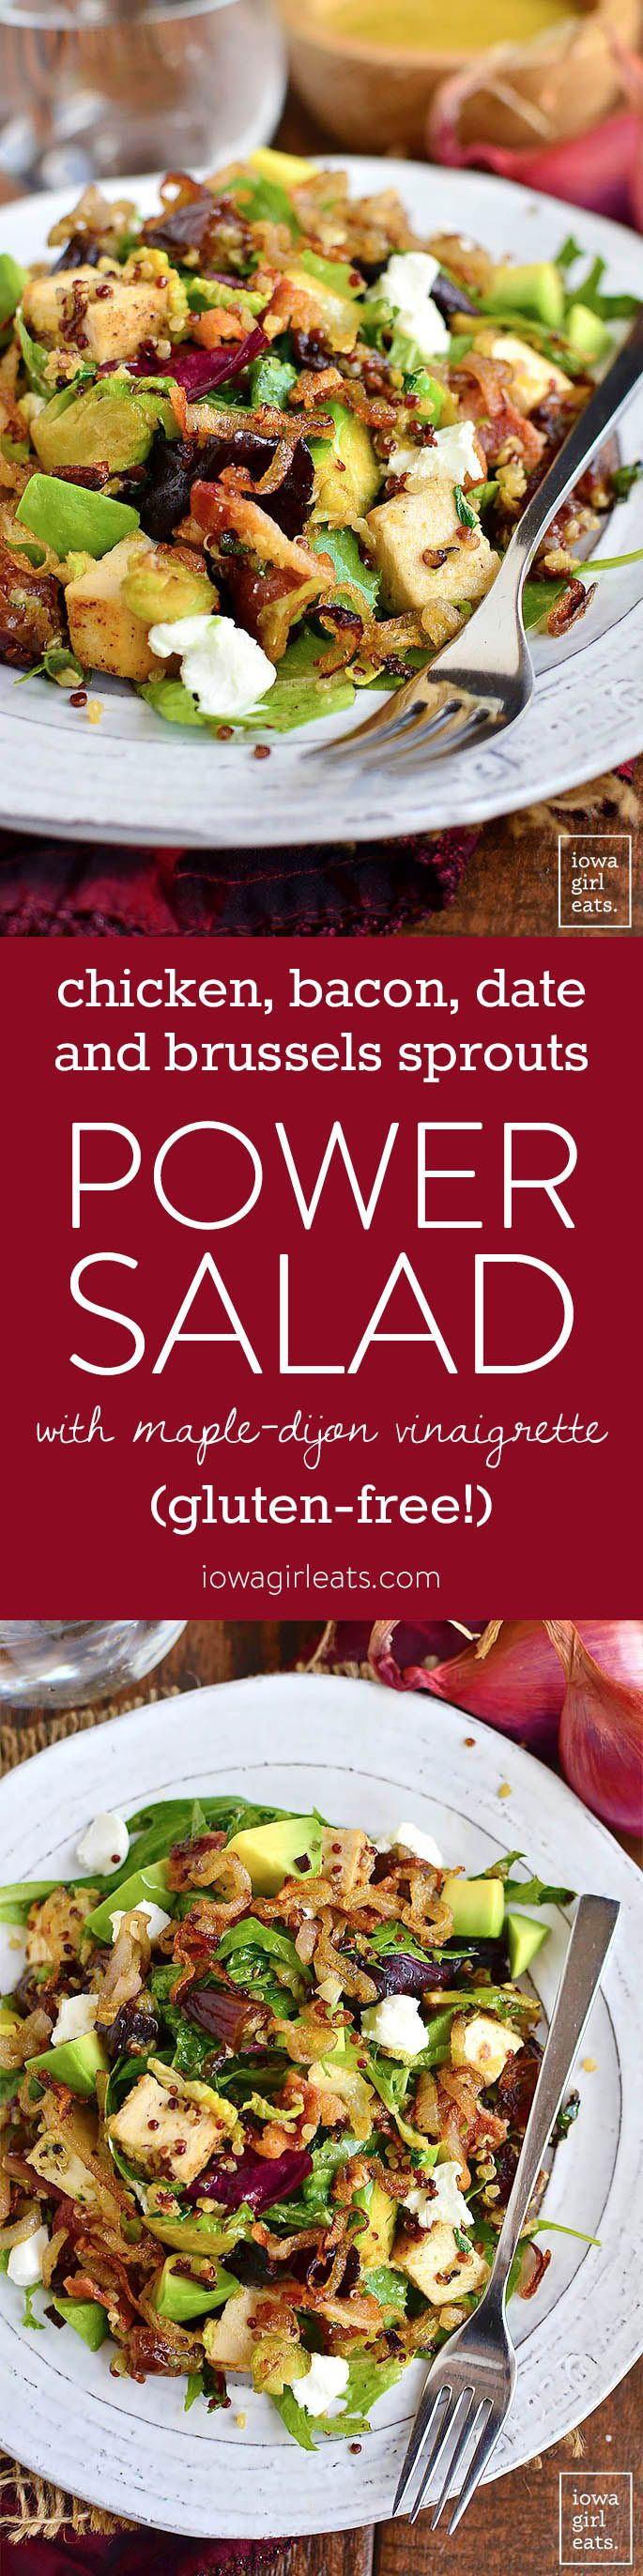 Quinoa Power Salad Iowa Girl Eats Recipe Power Salad Brussel Sprouts Recipes